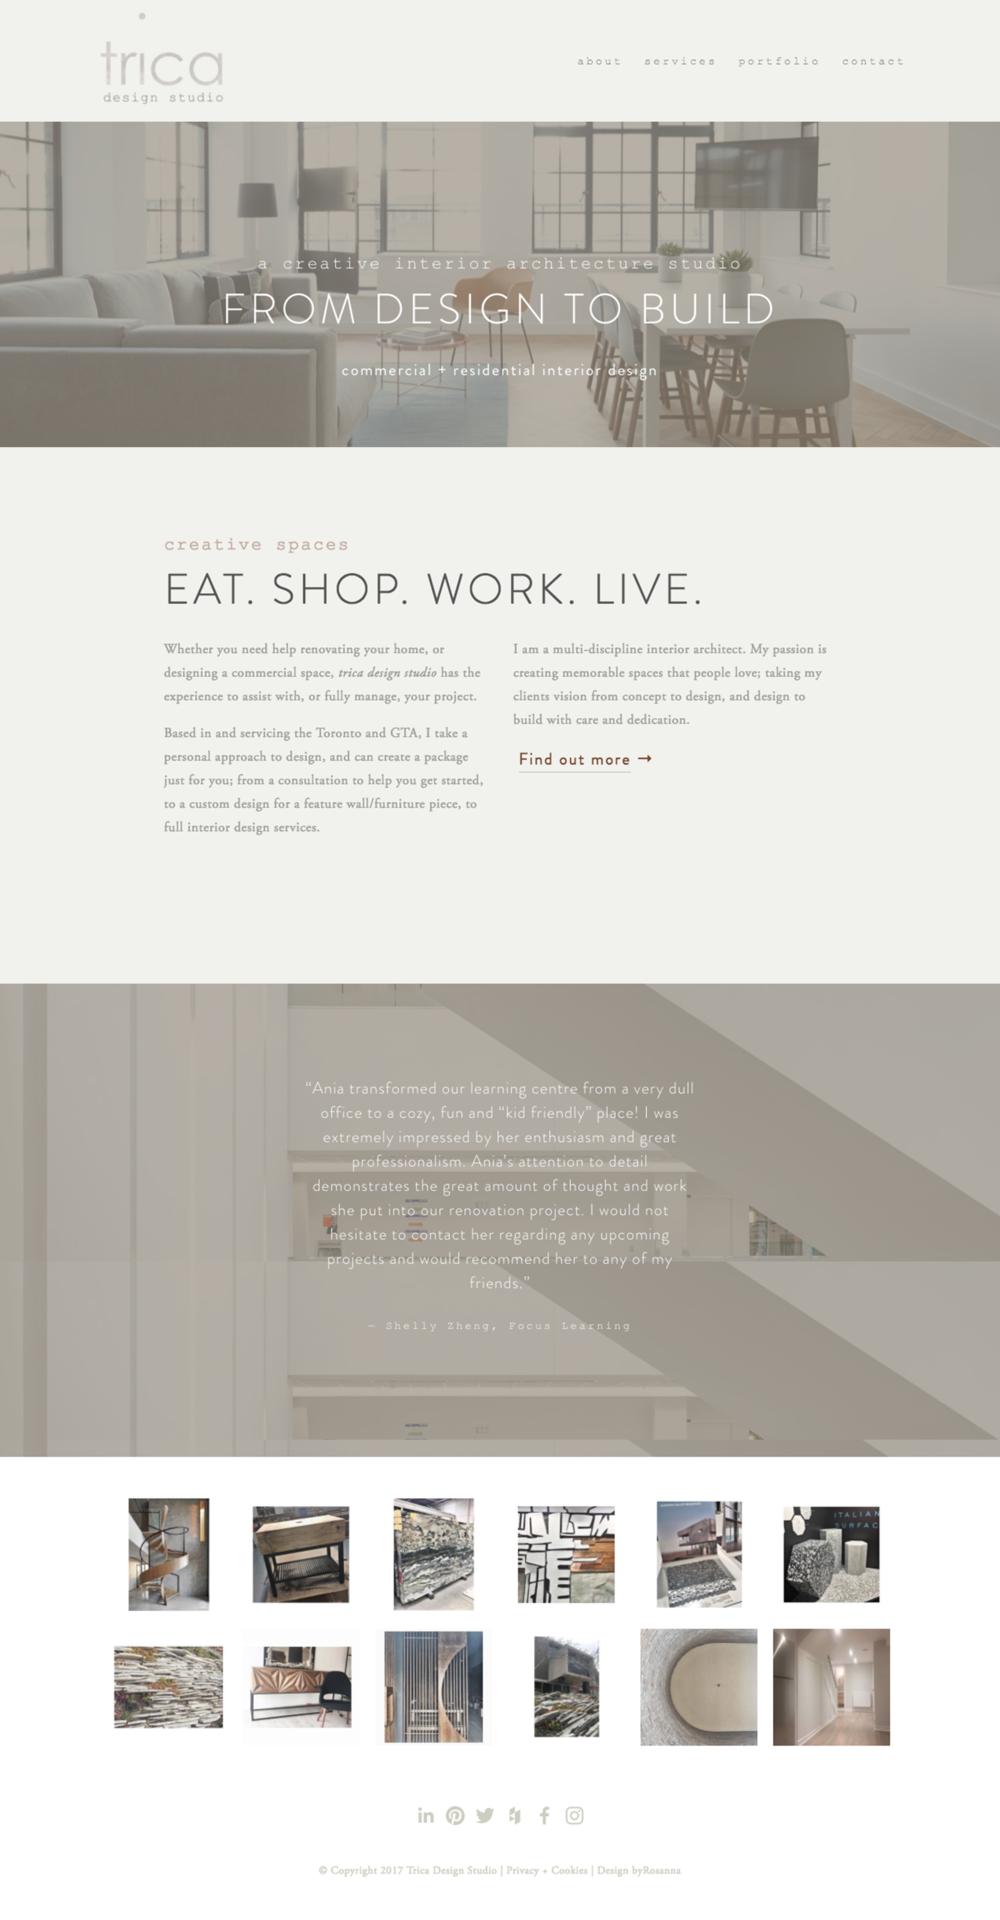 FireShot Capture 34 - Trica Design Studio I Interior Architect_ - https___www.tricadesignstudio.com_.png